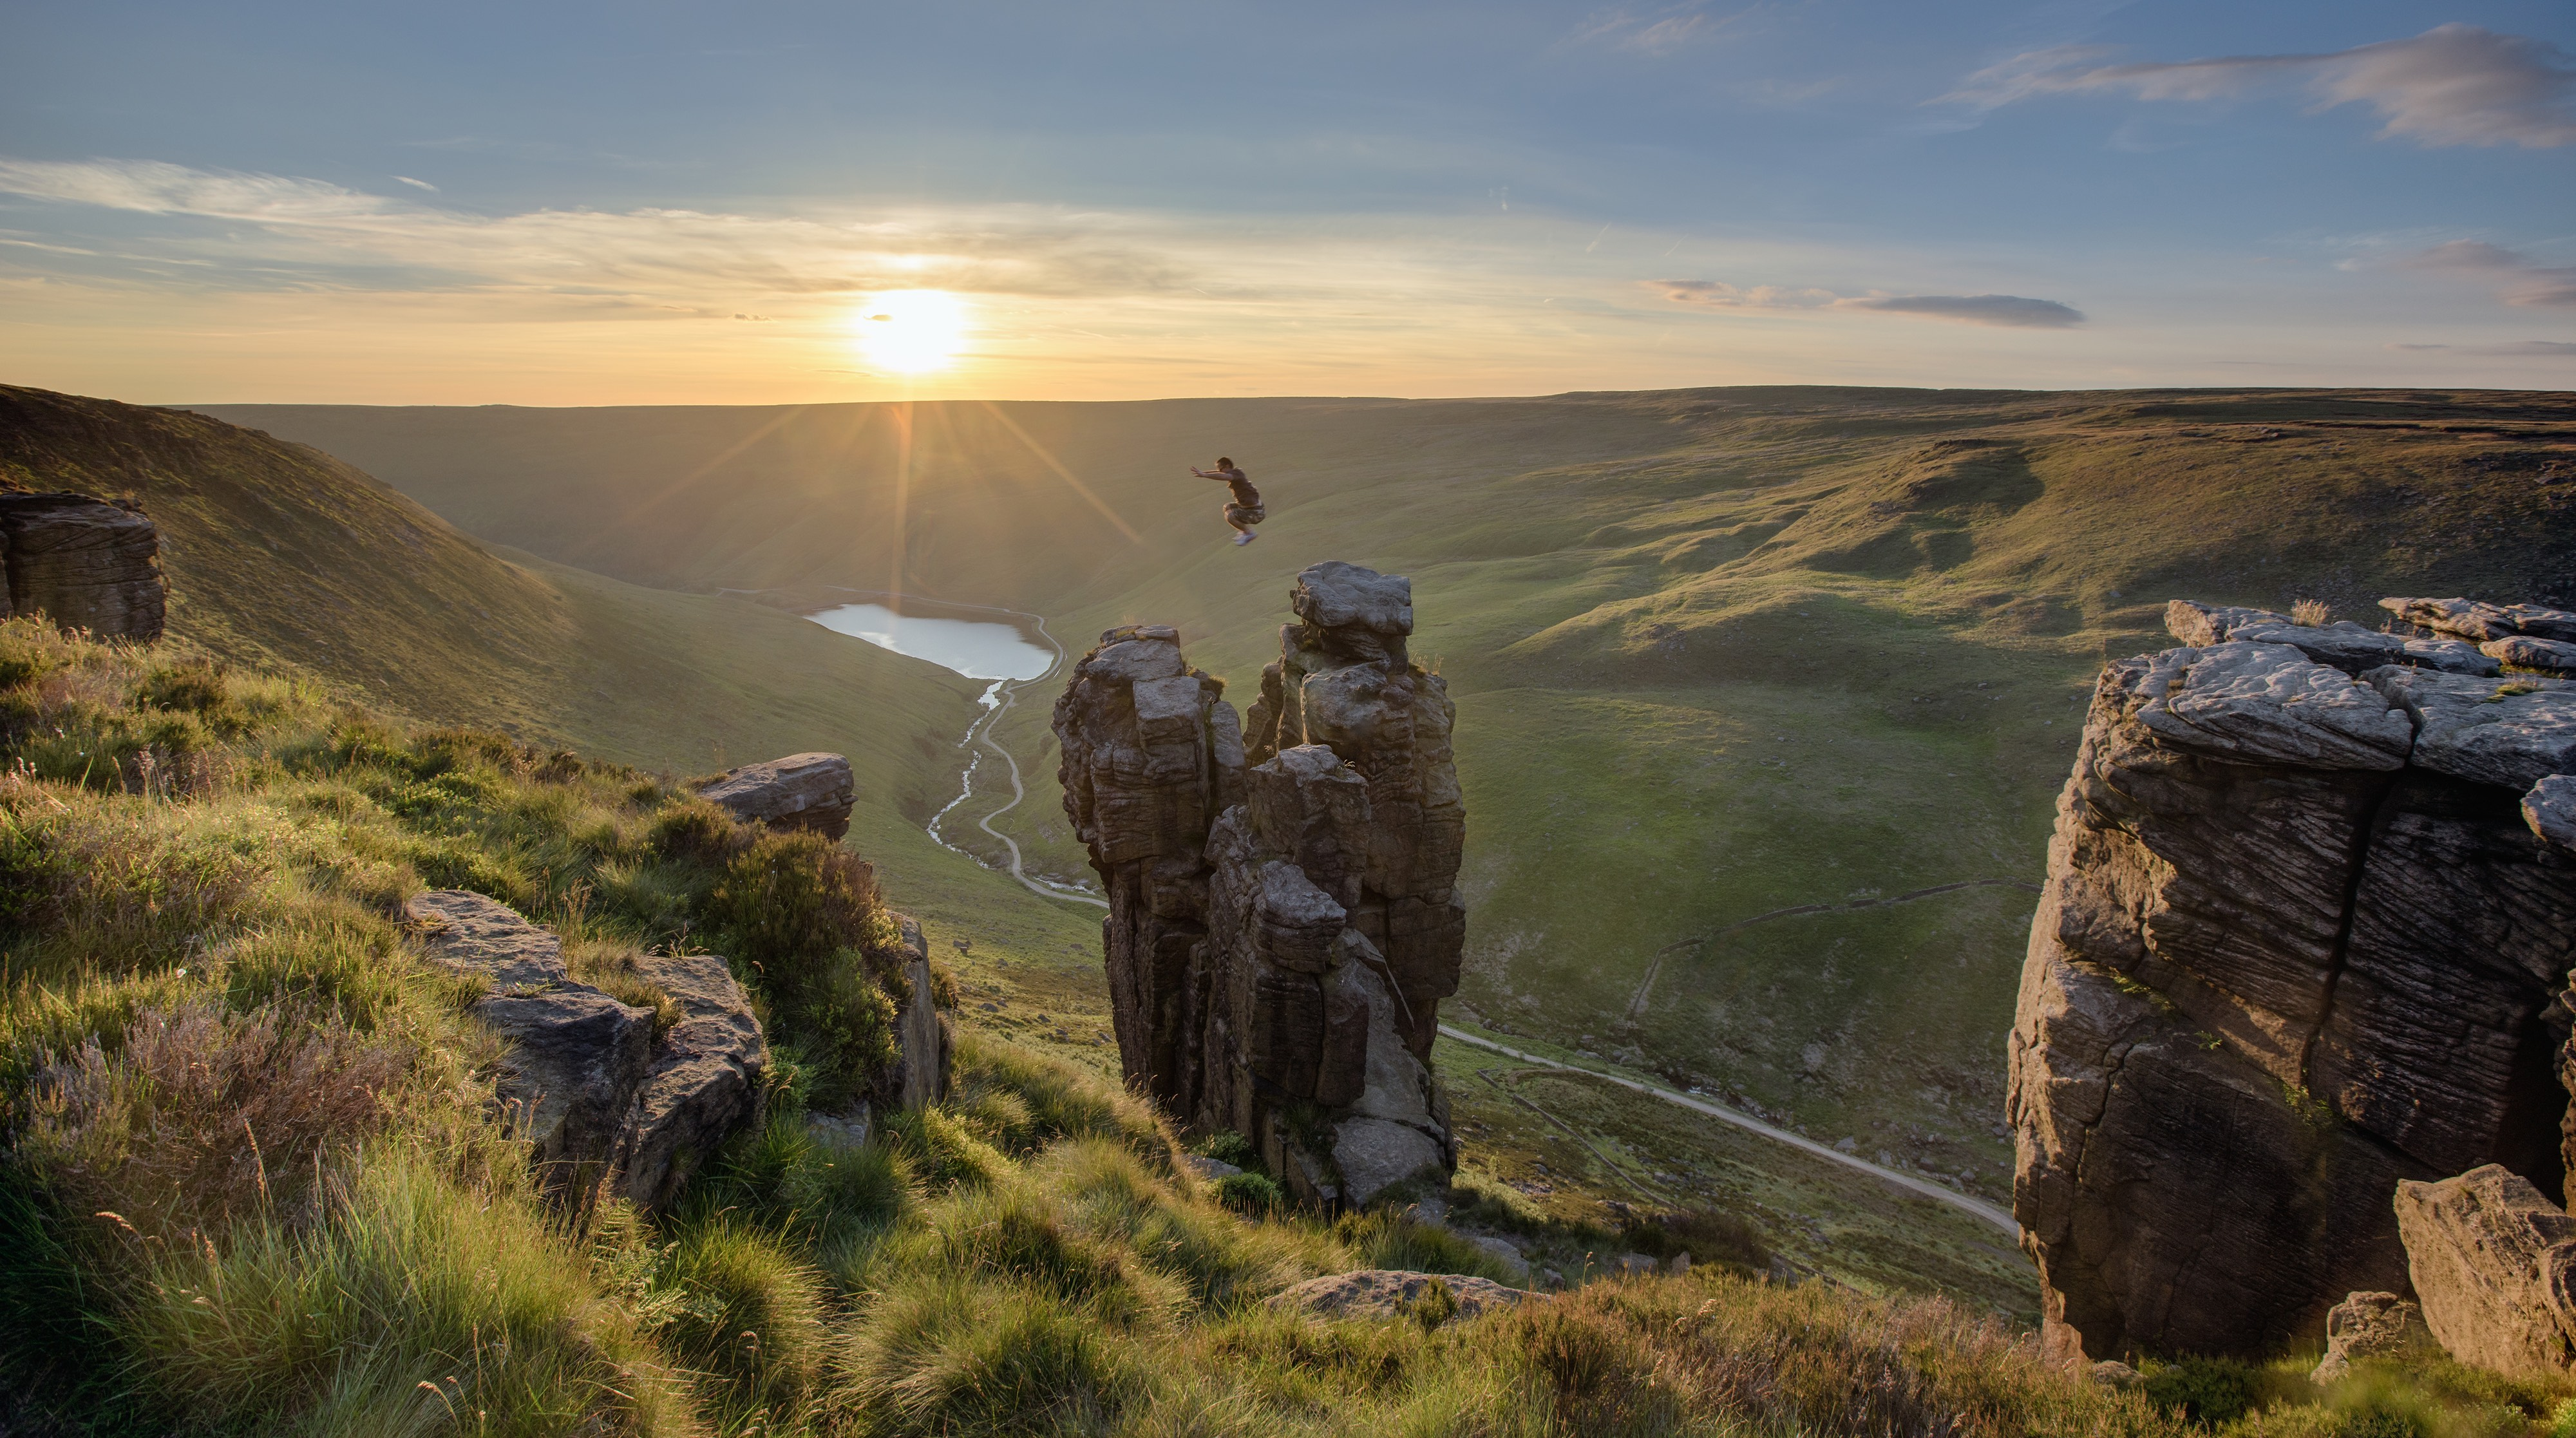 man jumping from pinnacle above a lake as the sun sets.